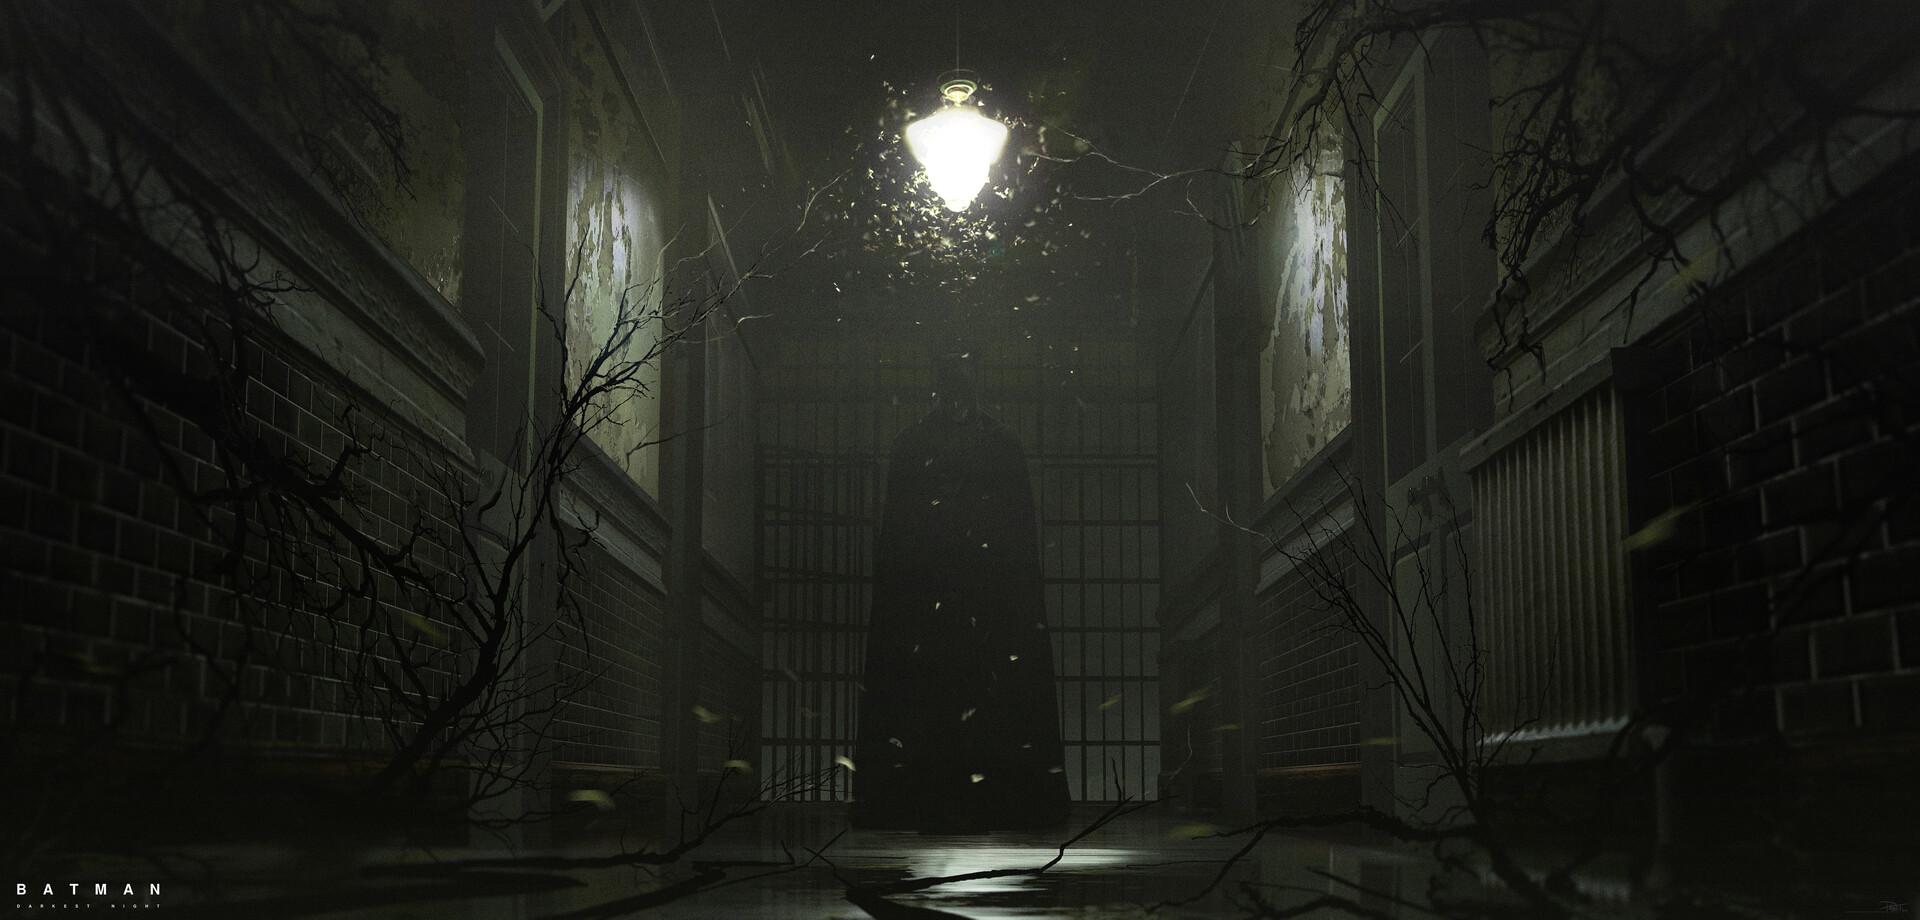 David paget corridor 1